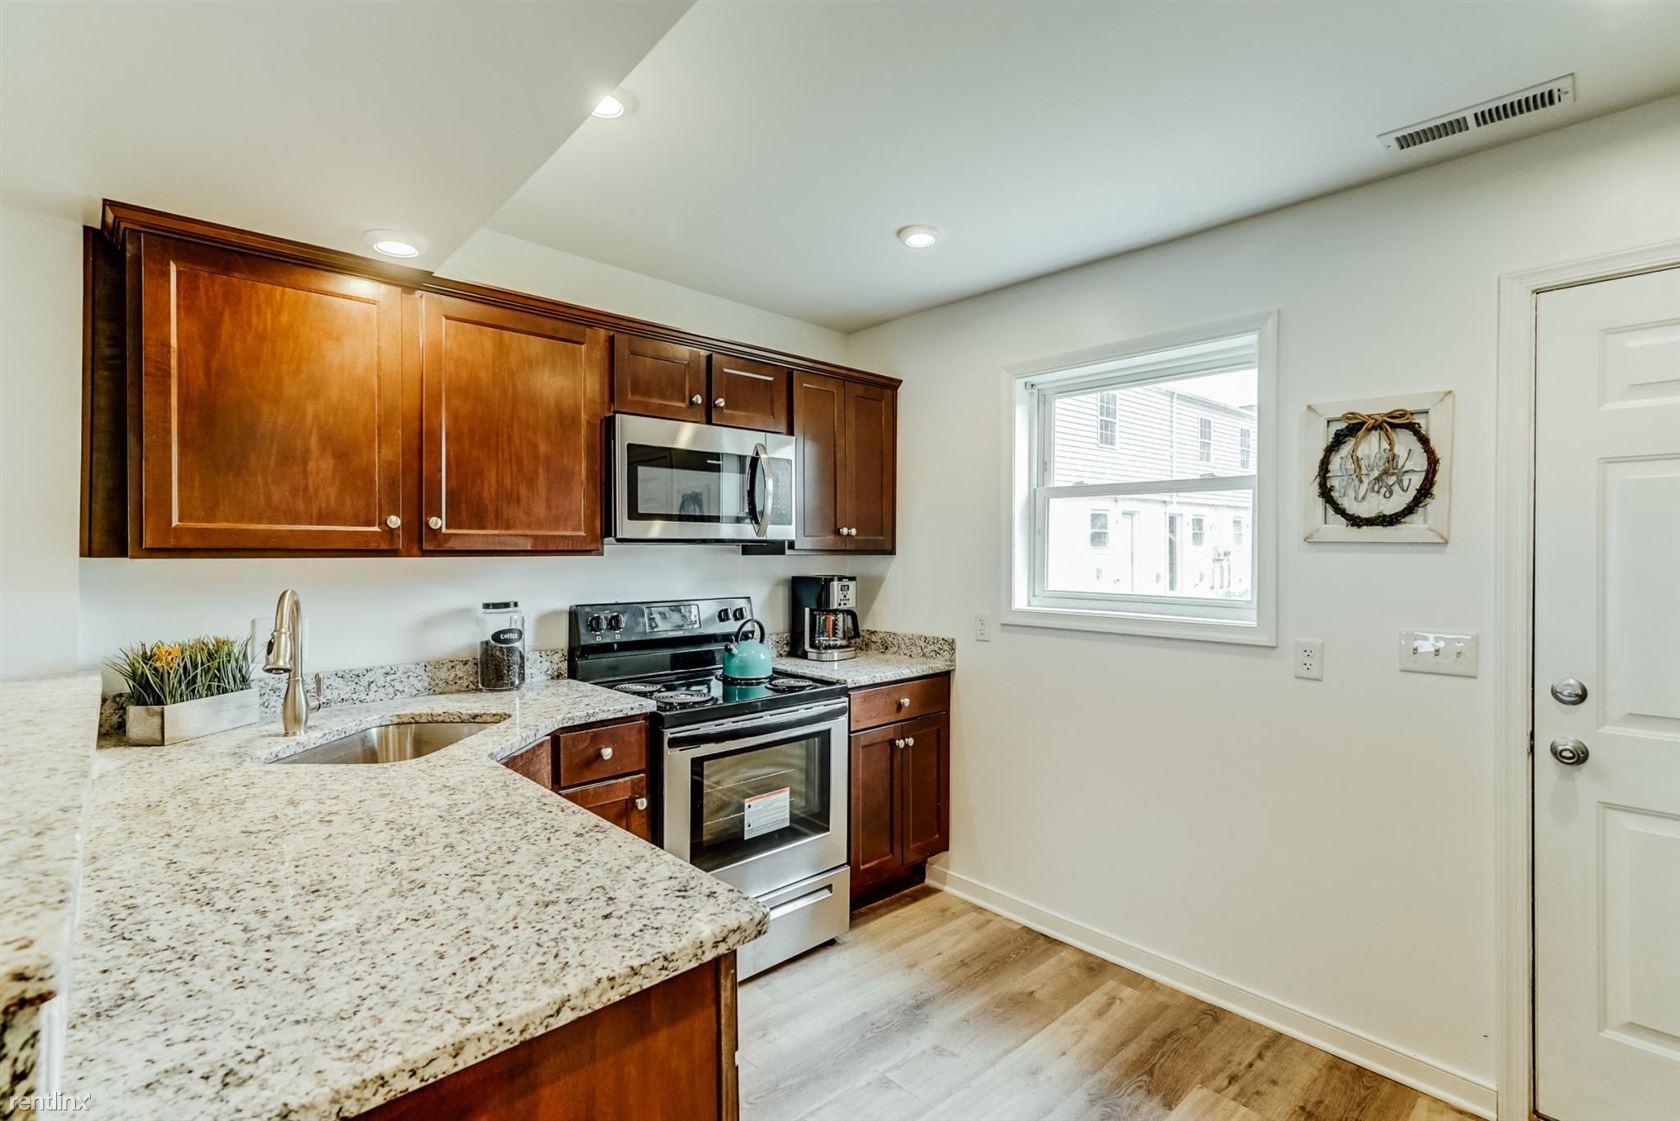 509 N 35th St, Richmond, VA - $1,195